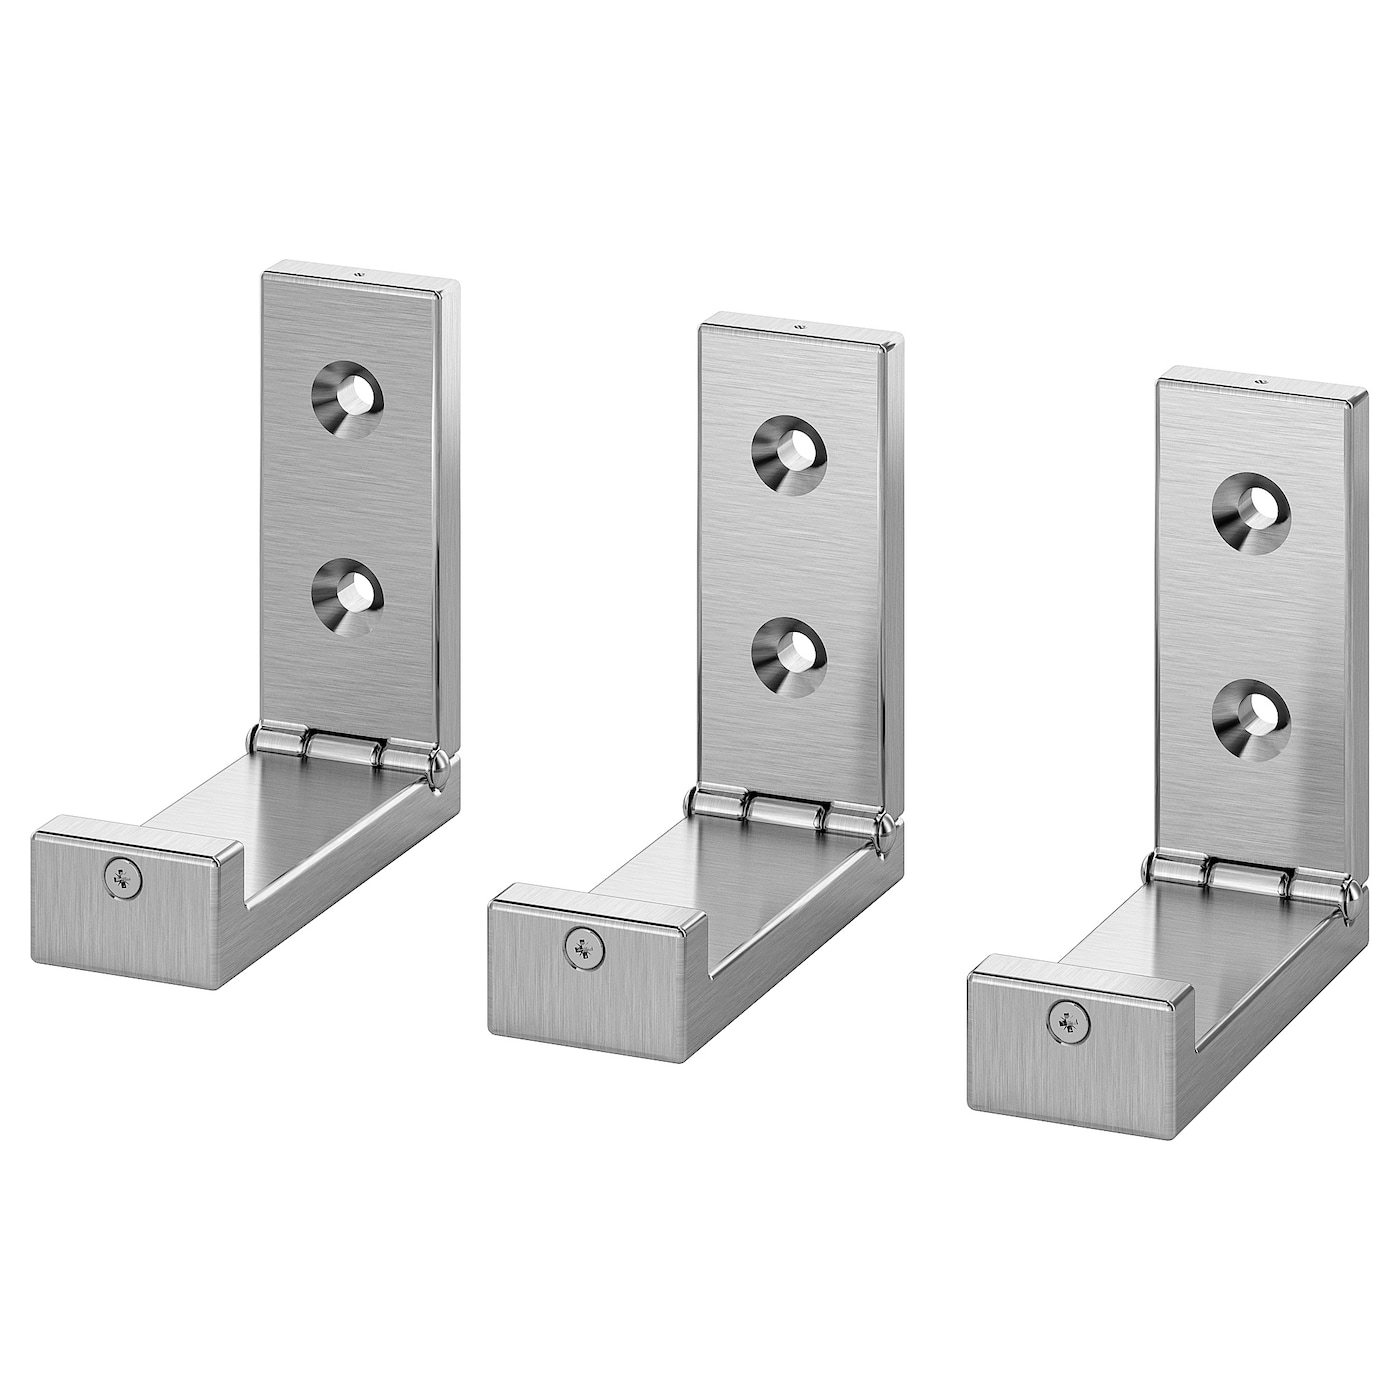 BJÄRNUM Folding hook - aluminium 9 cm